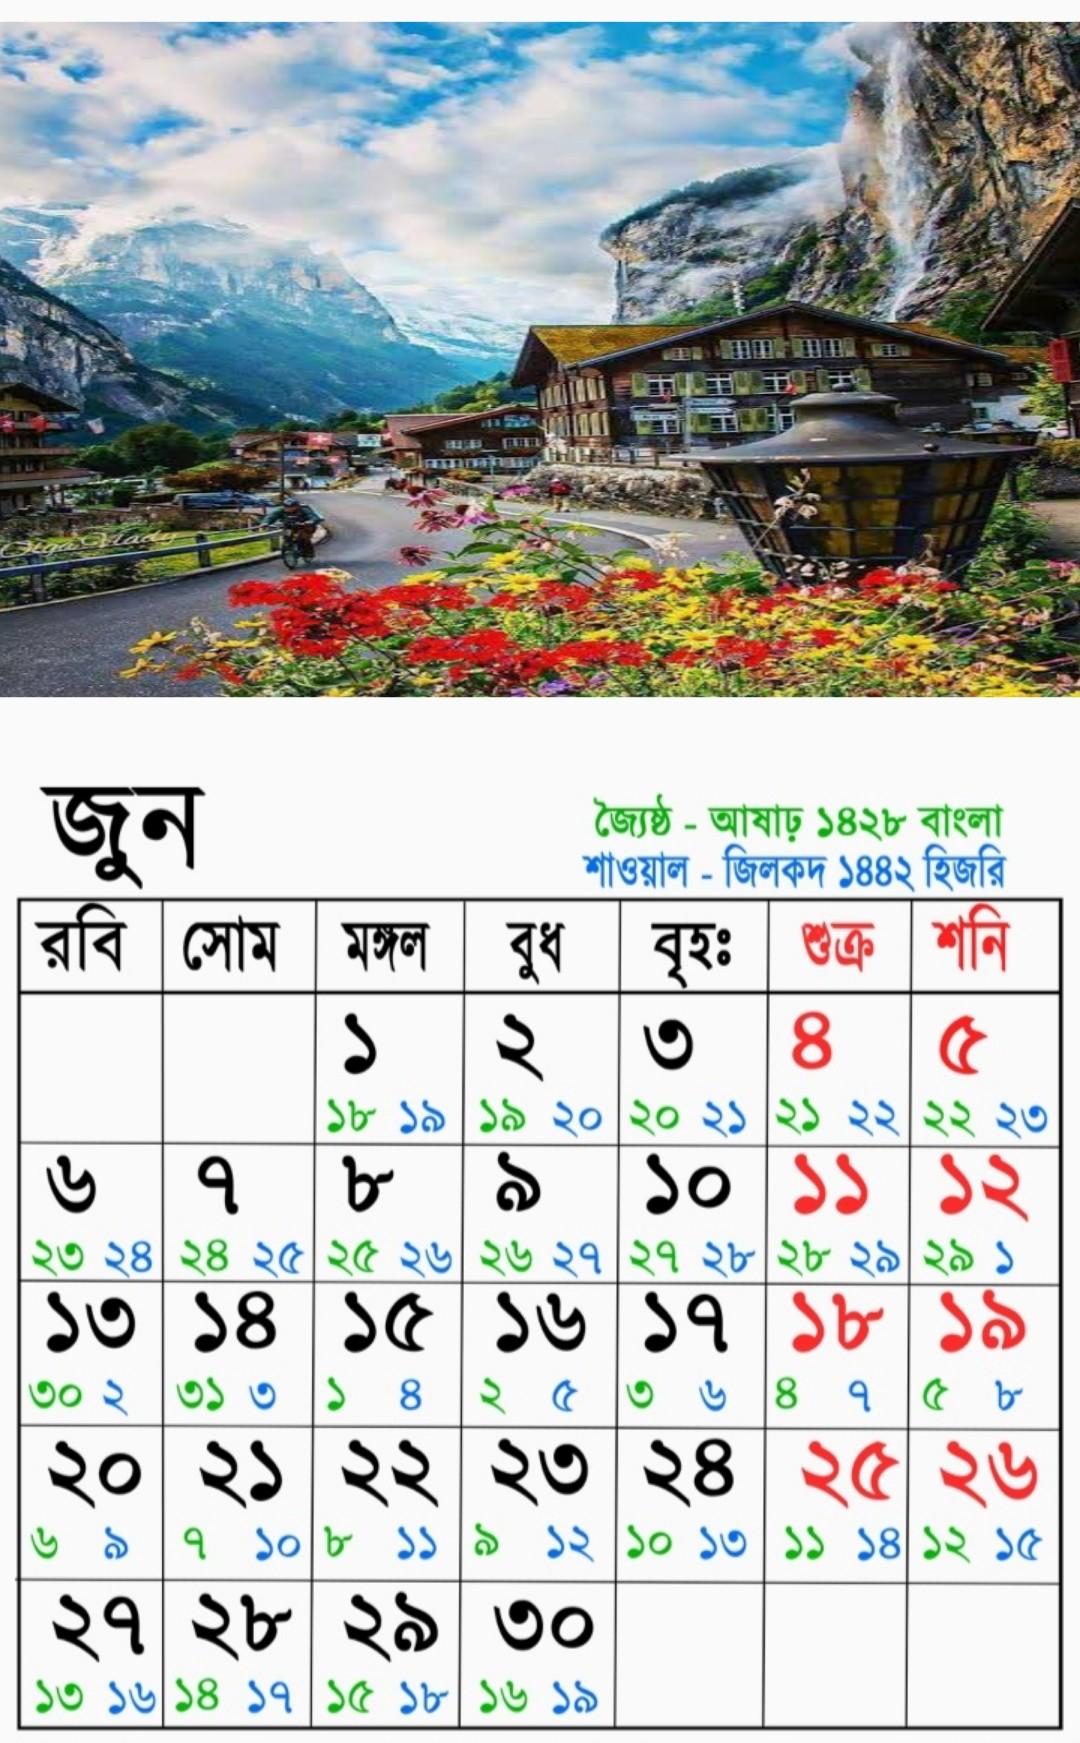 June Bangla English Arabi Calendar 2021 | জুন বাংলা ইংরেজি আরবি ক্যালেন্ডার ২০২১